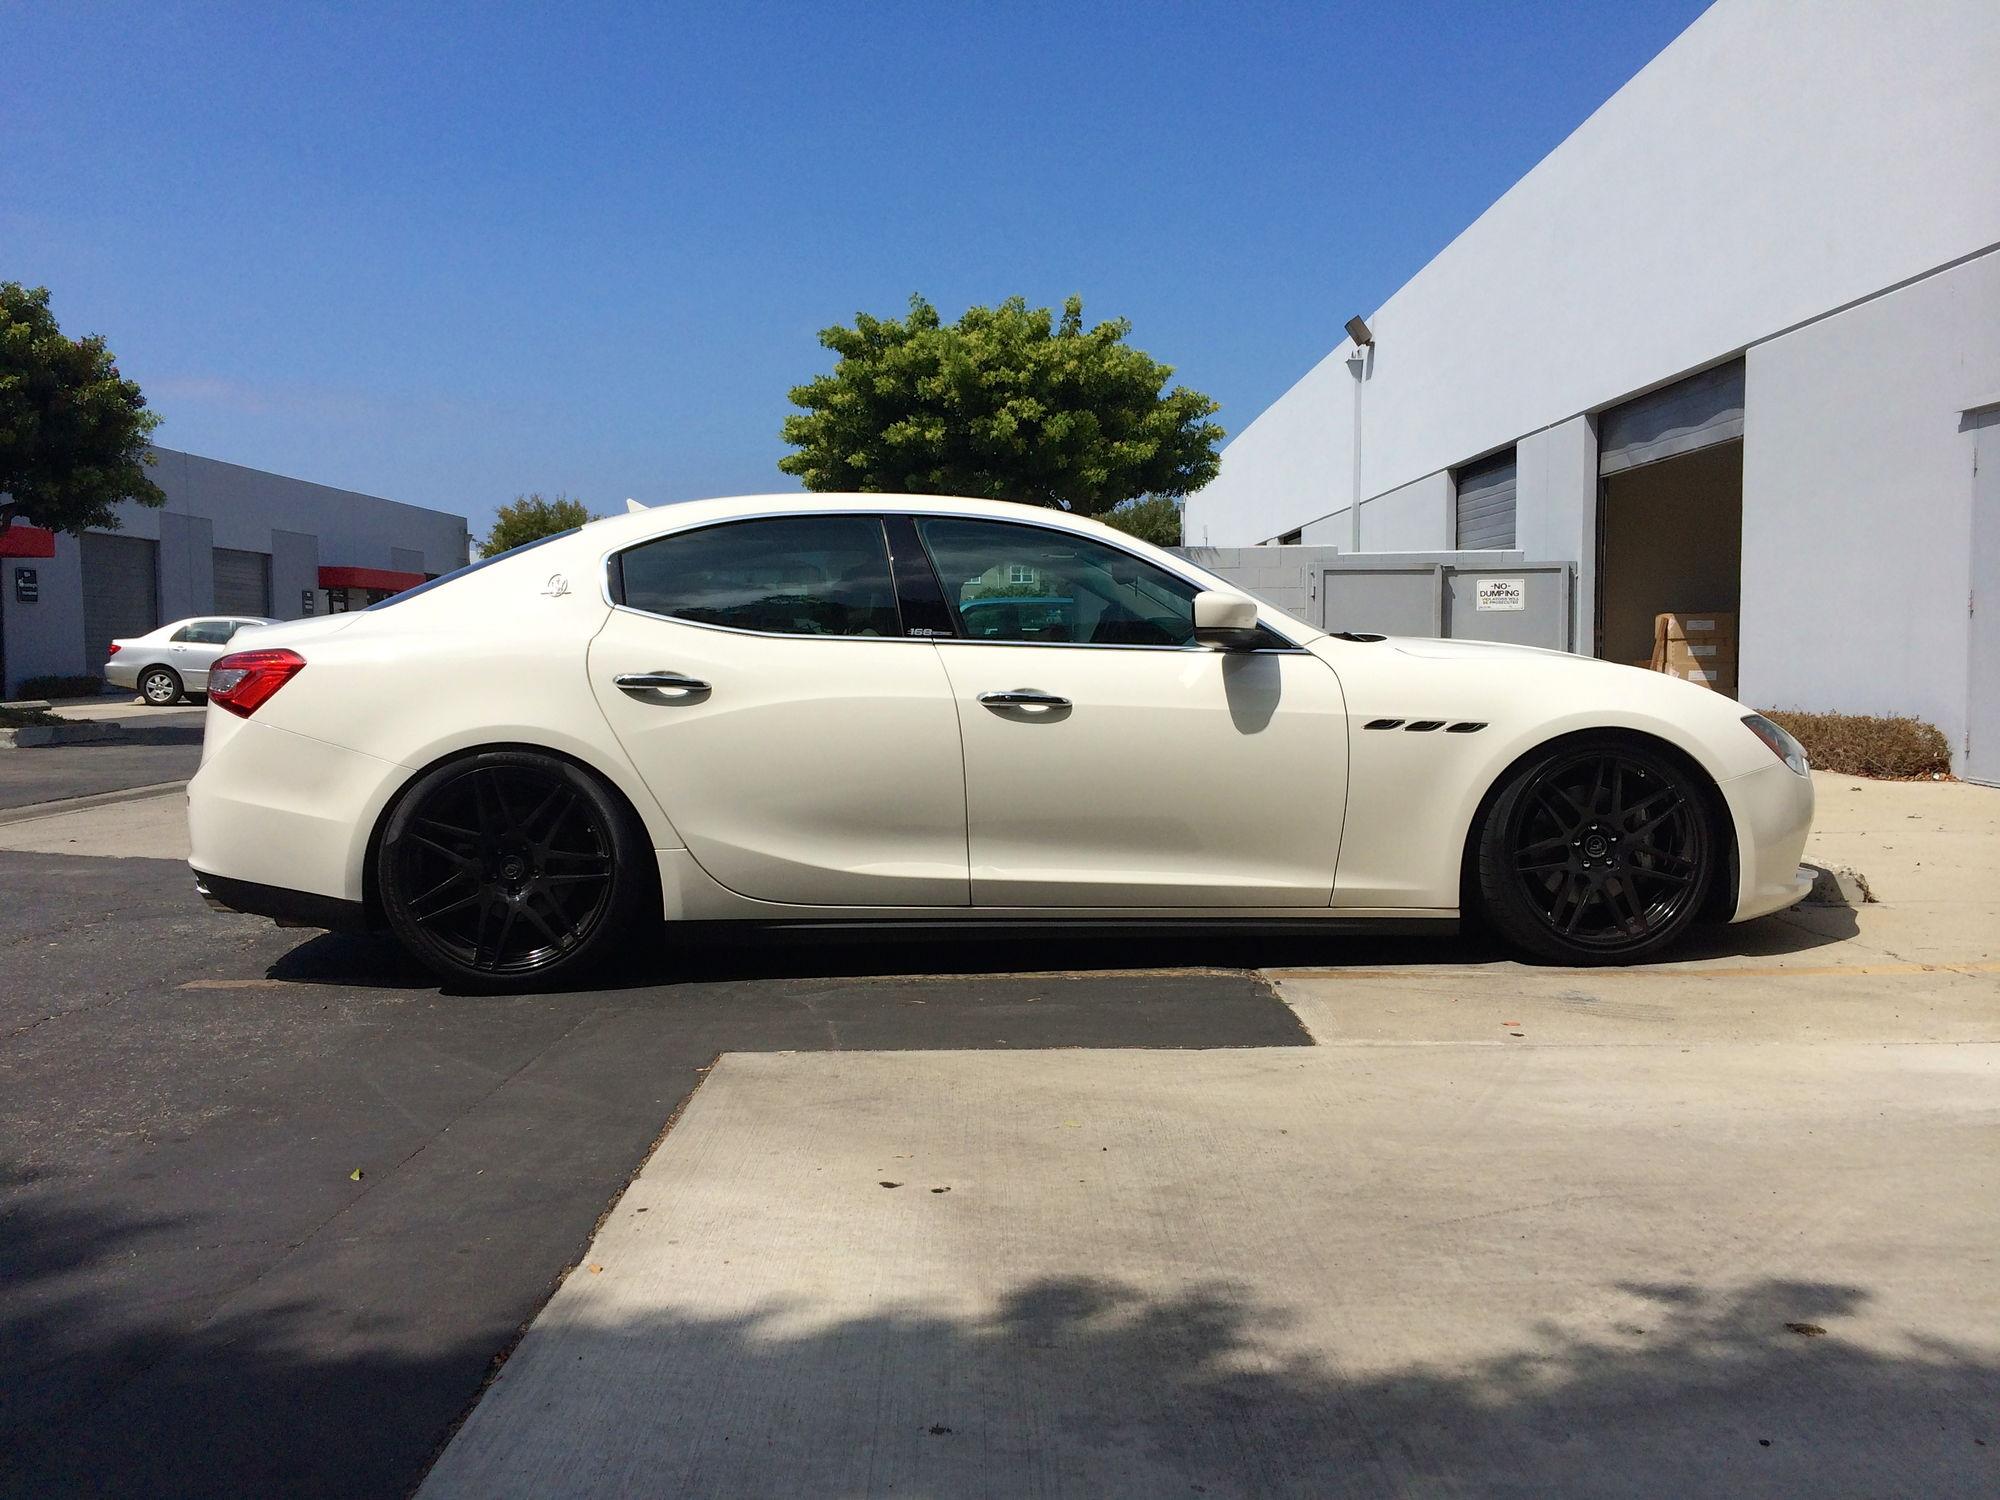 "Used Maserati Ghibli >> Maserati Ghibli Lowered on Megan Coilovers and 20"" Forgestars F14 - 6SpeedOnline - Porsche Forum ..."